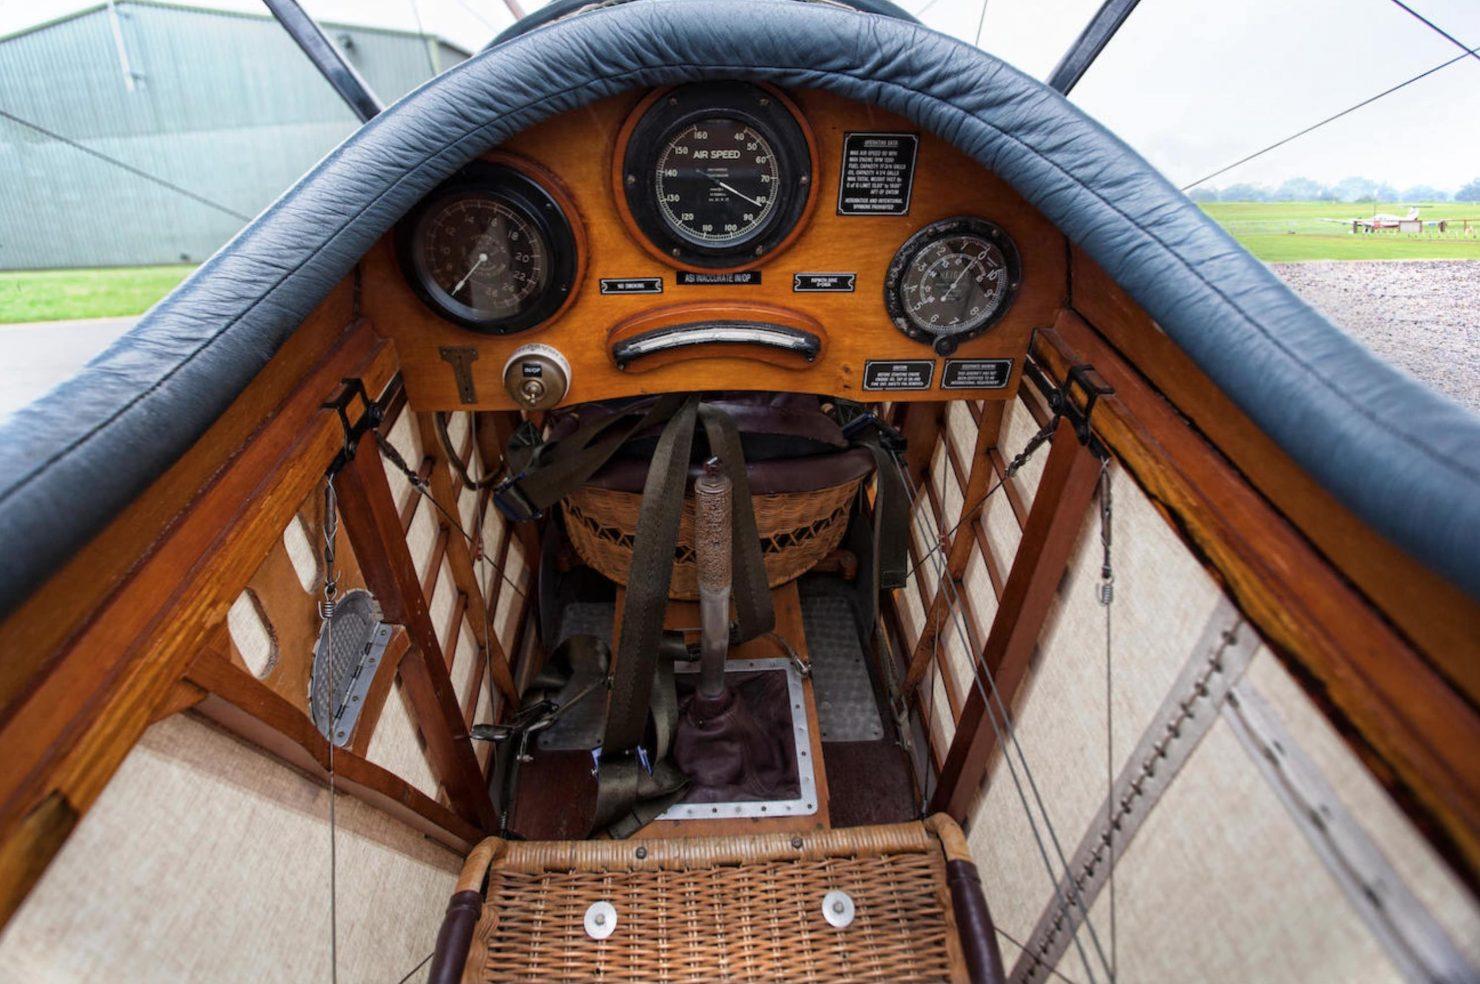 Sopwith Dove 1480x984 - Sopwith Dove Biplane